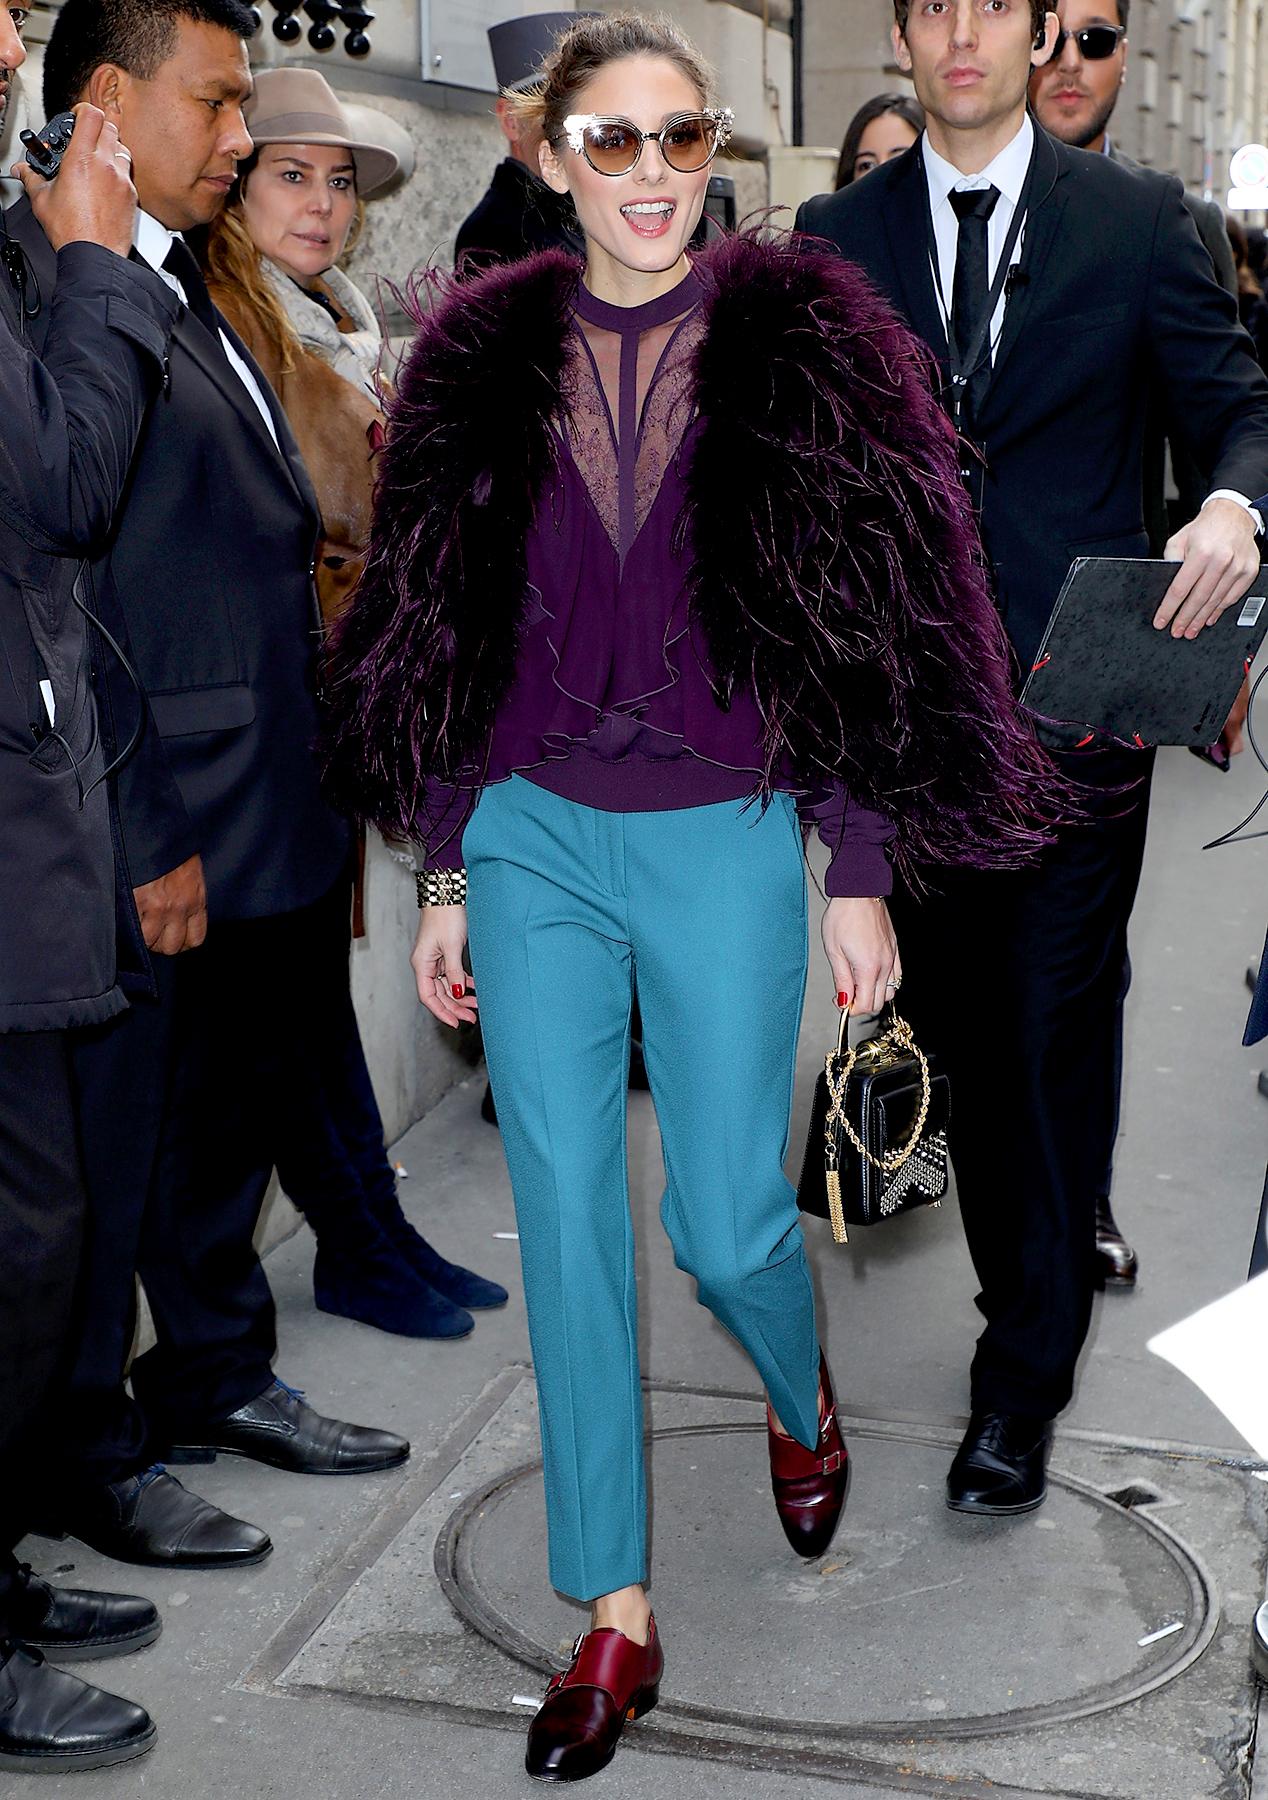 Paris Fashion Week Spring-Summer 2018: Celeb Street Style Looks